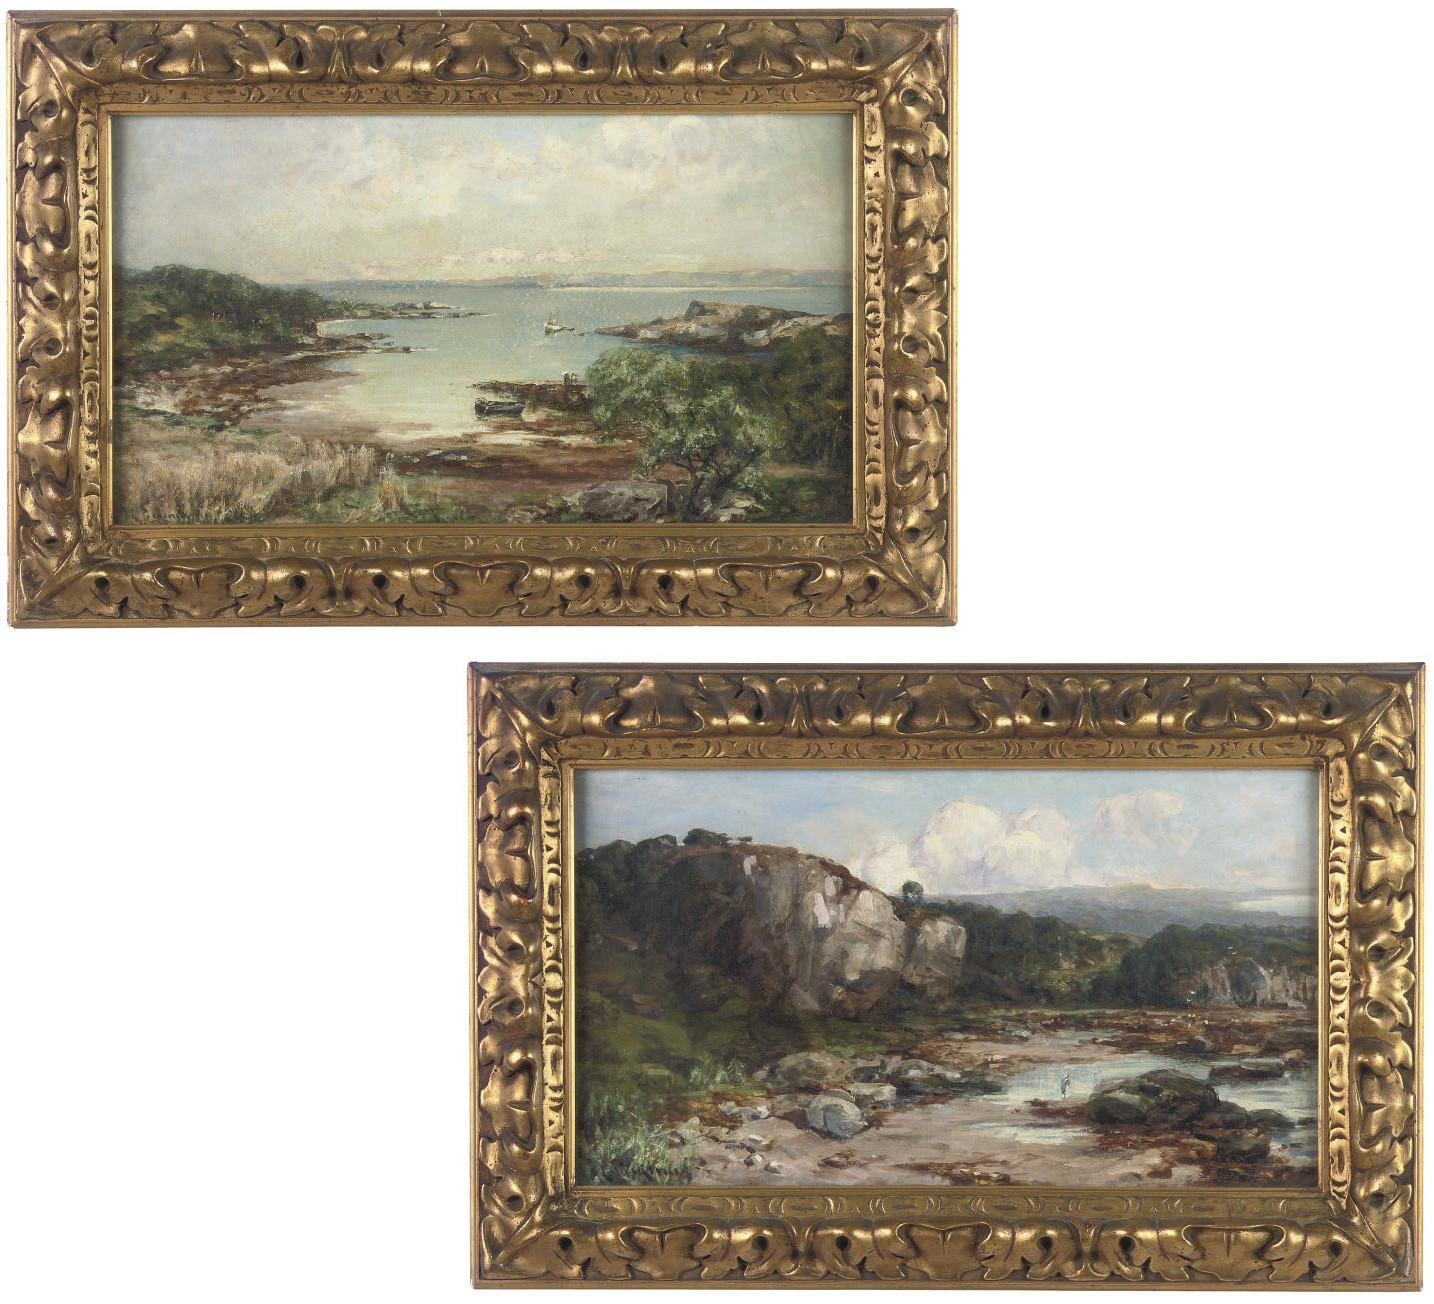 JOSEPH LANGSDALE PICKERING, R.B.A., R.O.I. (BRITISH, 1845-1917)